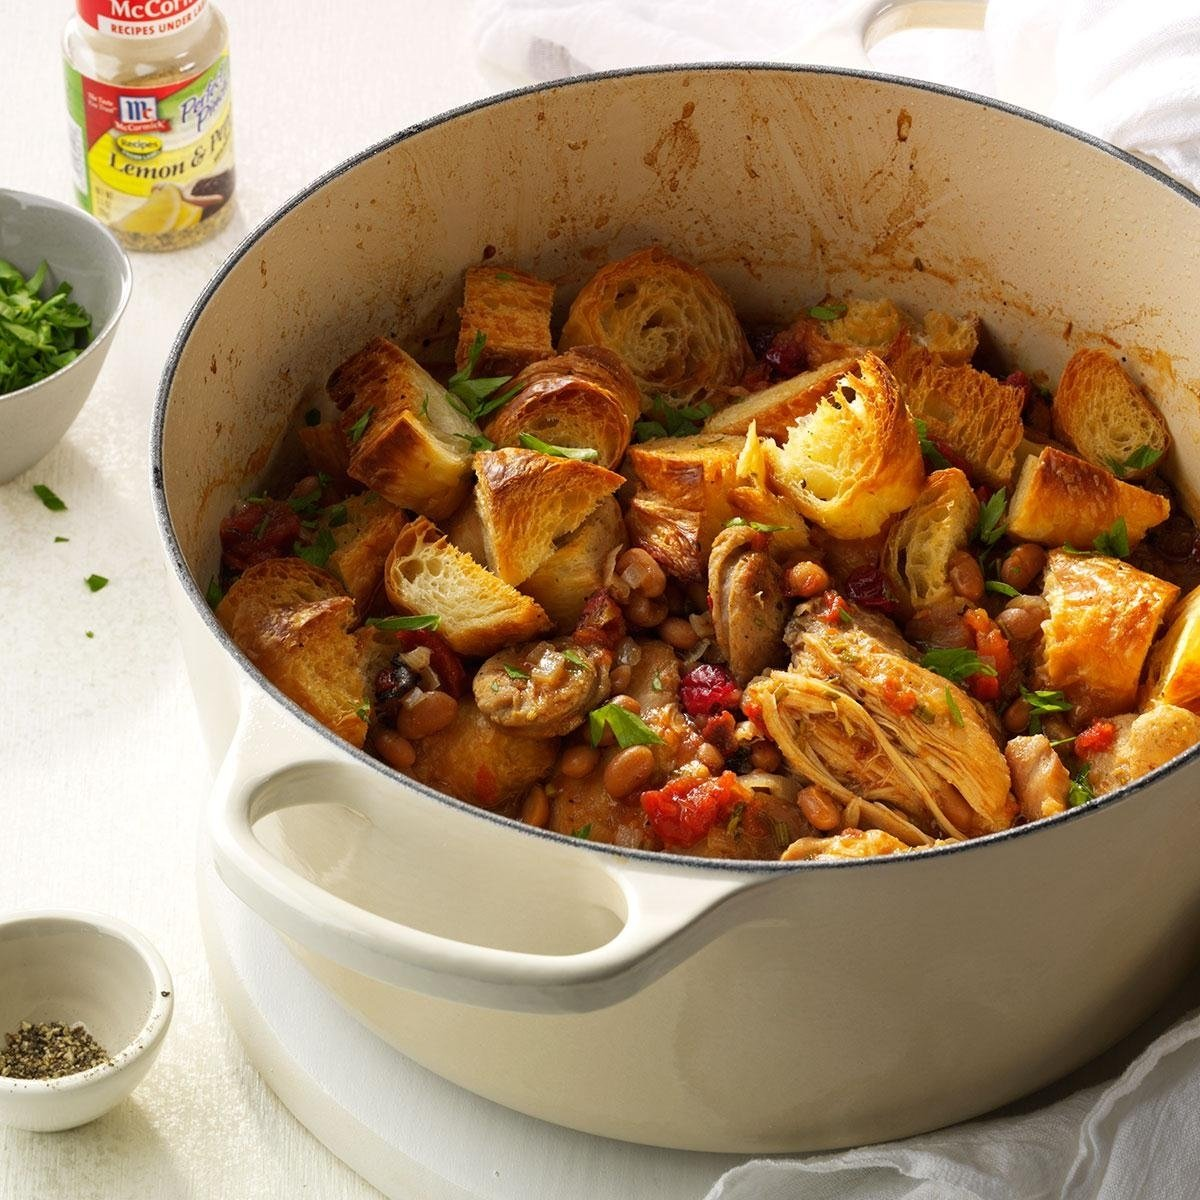 10 Trendy Simple Christmas Eve Dinner Ideas new england bean bog cassoulet recipe taste of home 2020